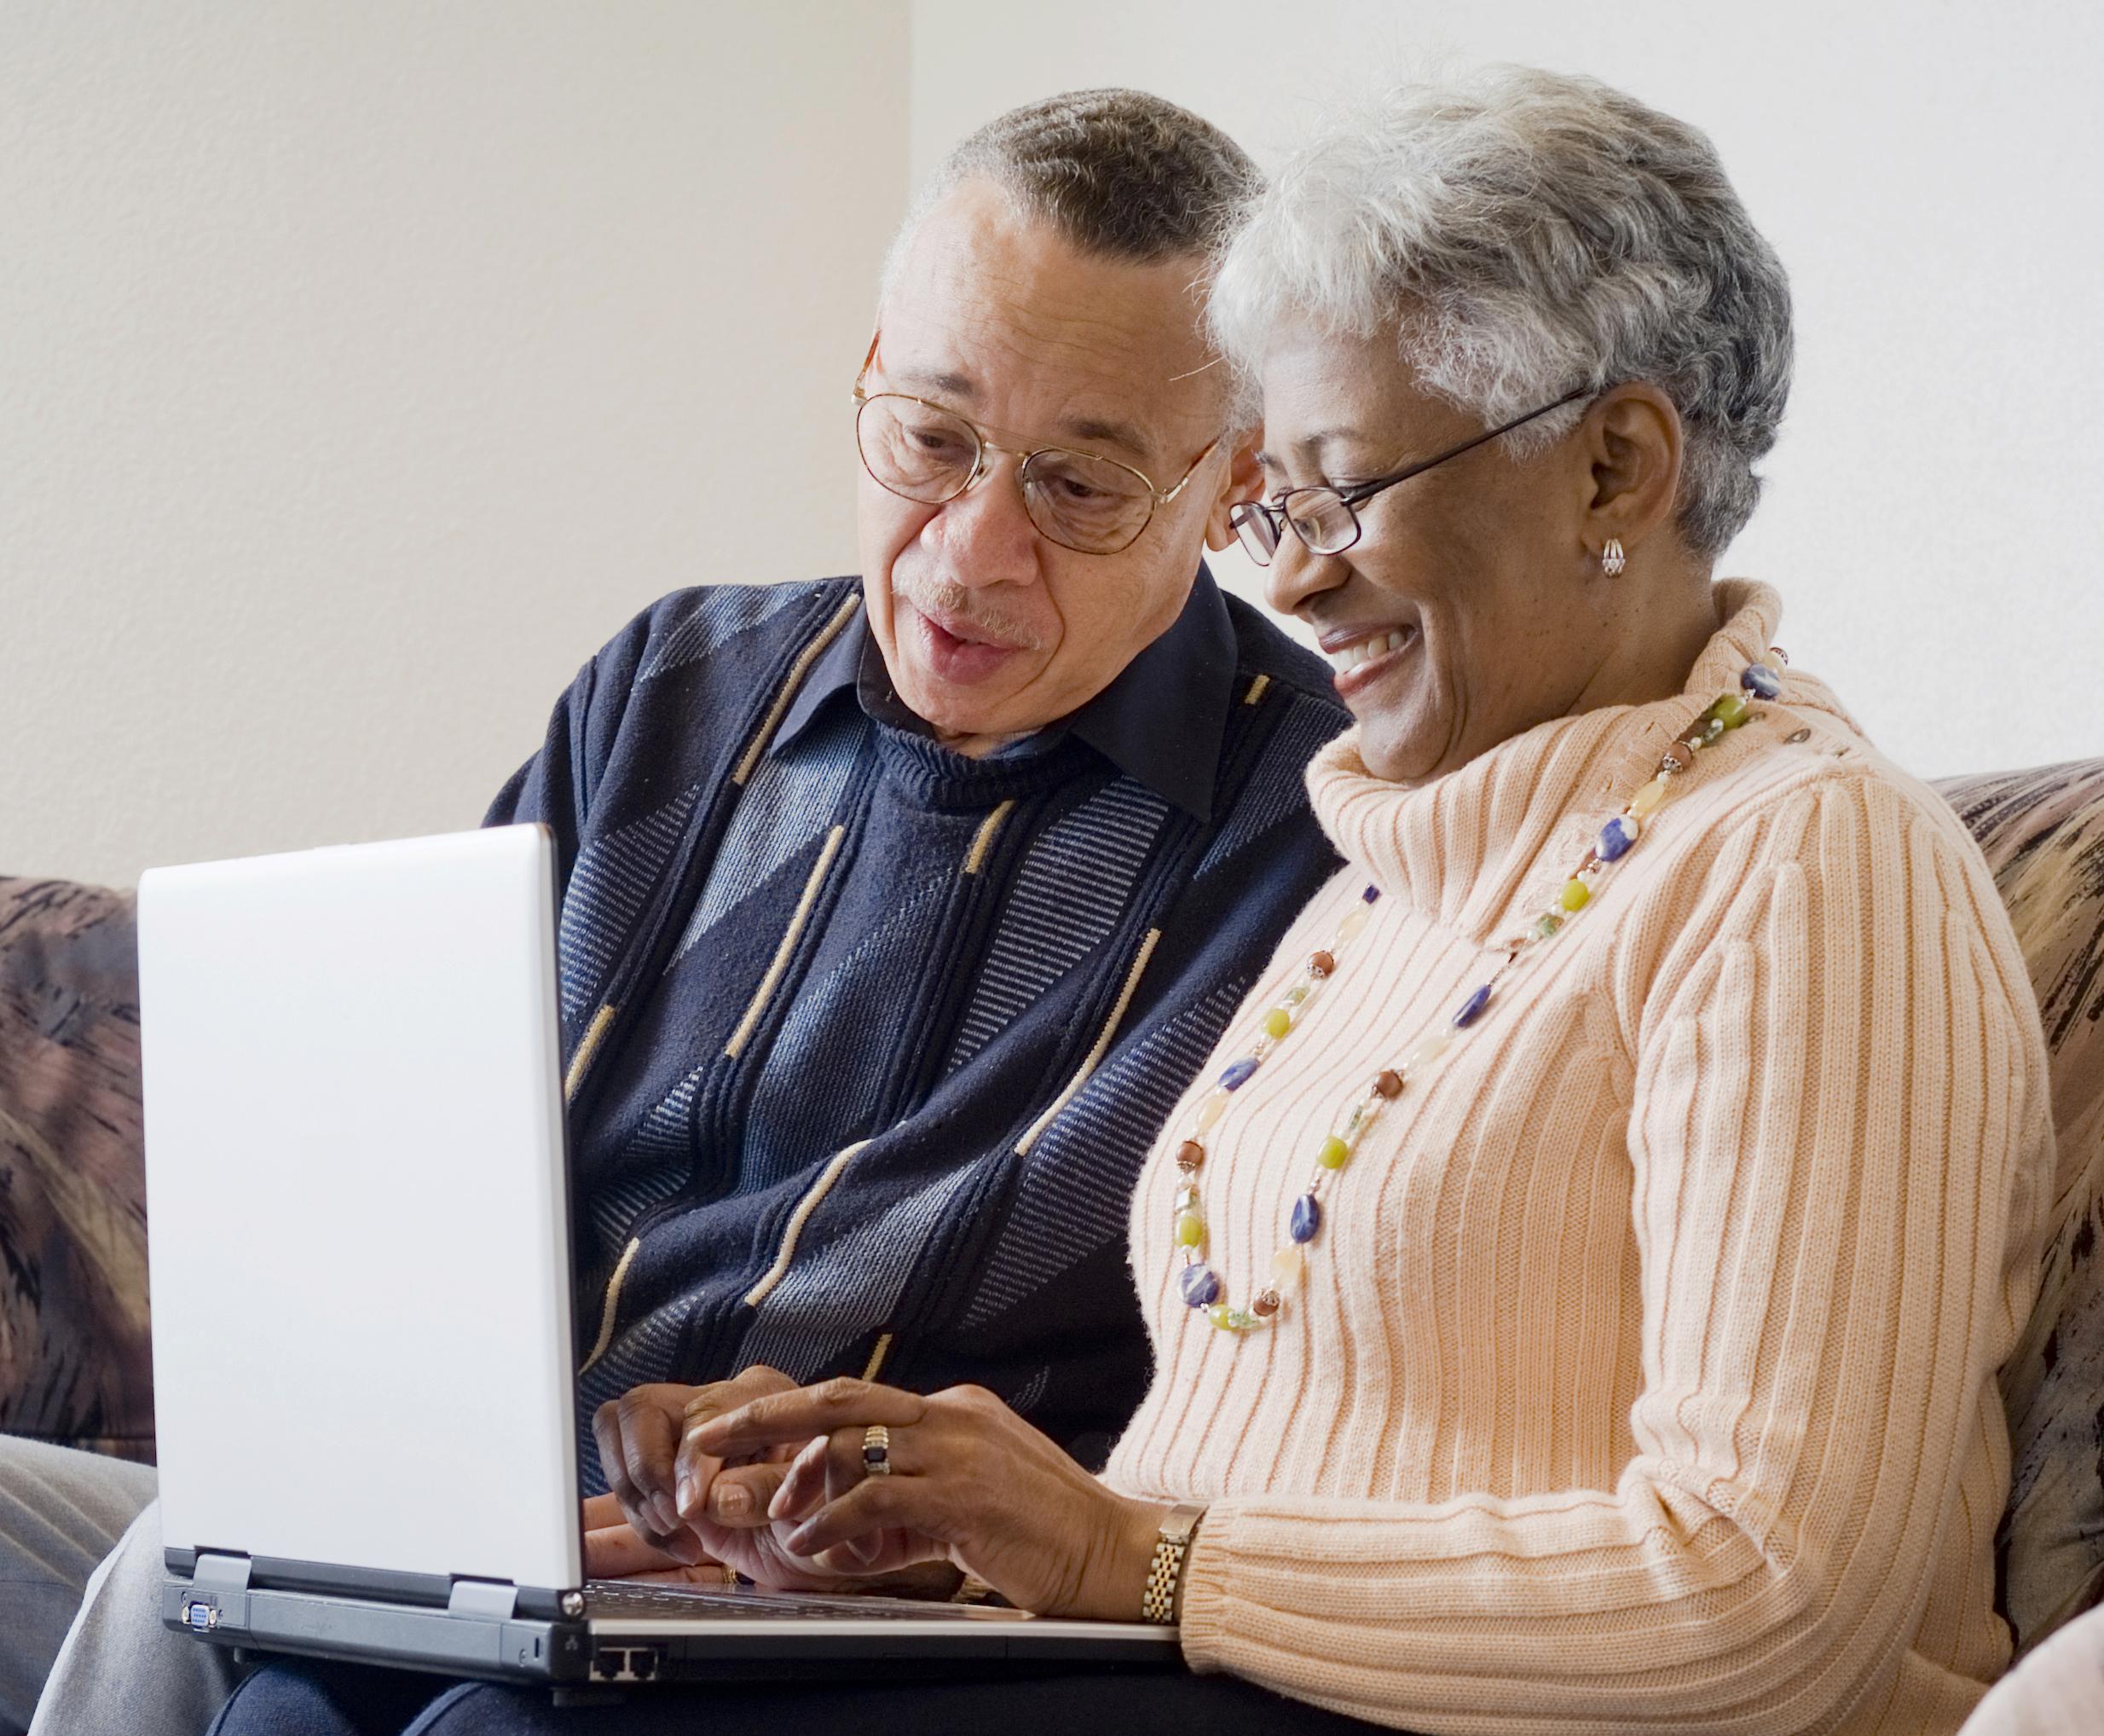 Philippines Ukrainian Senior Dating Online Site